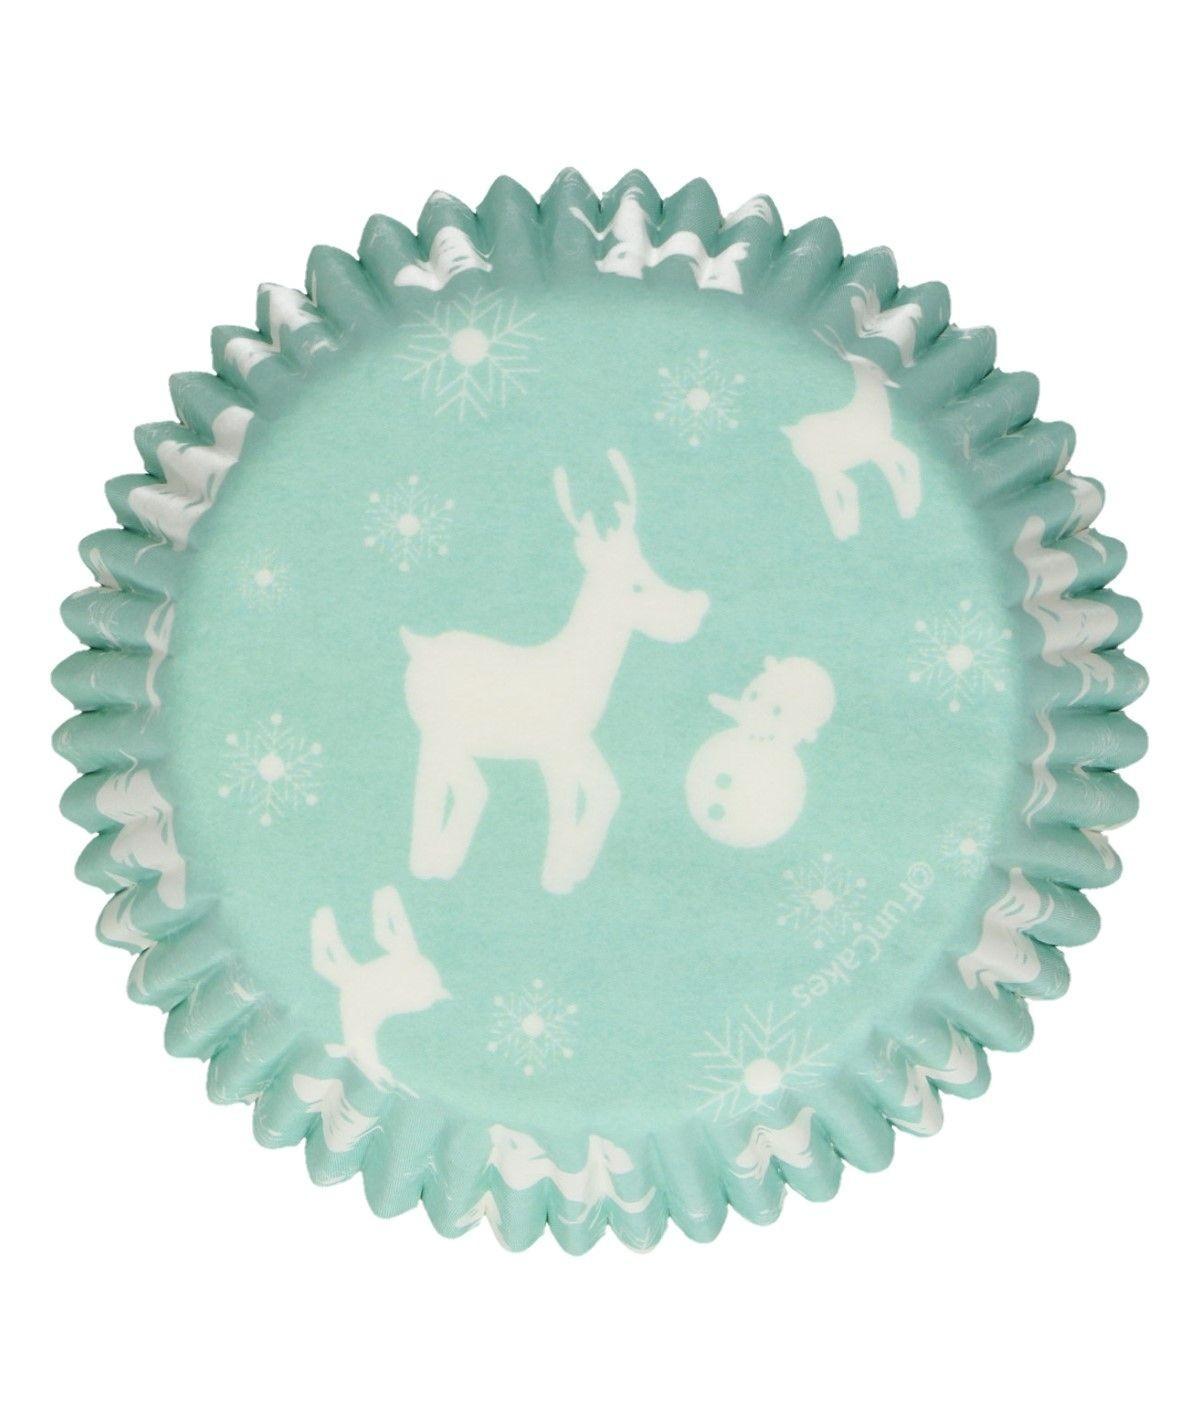 FunCakes - Baking Cups -Winter Wonderland- pk/48